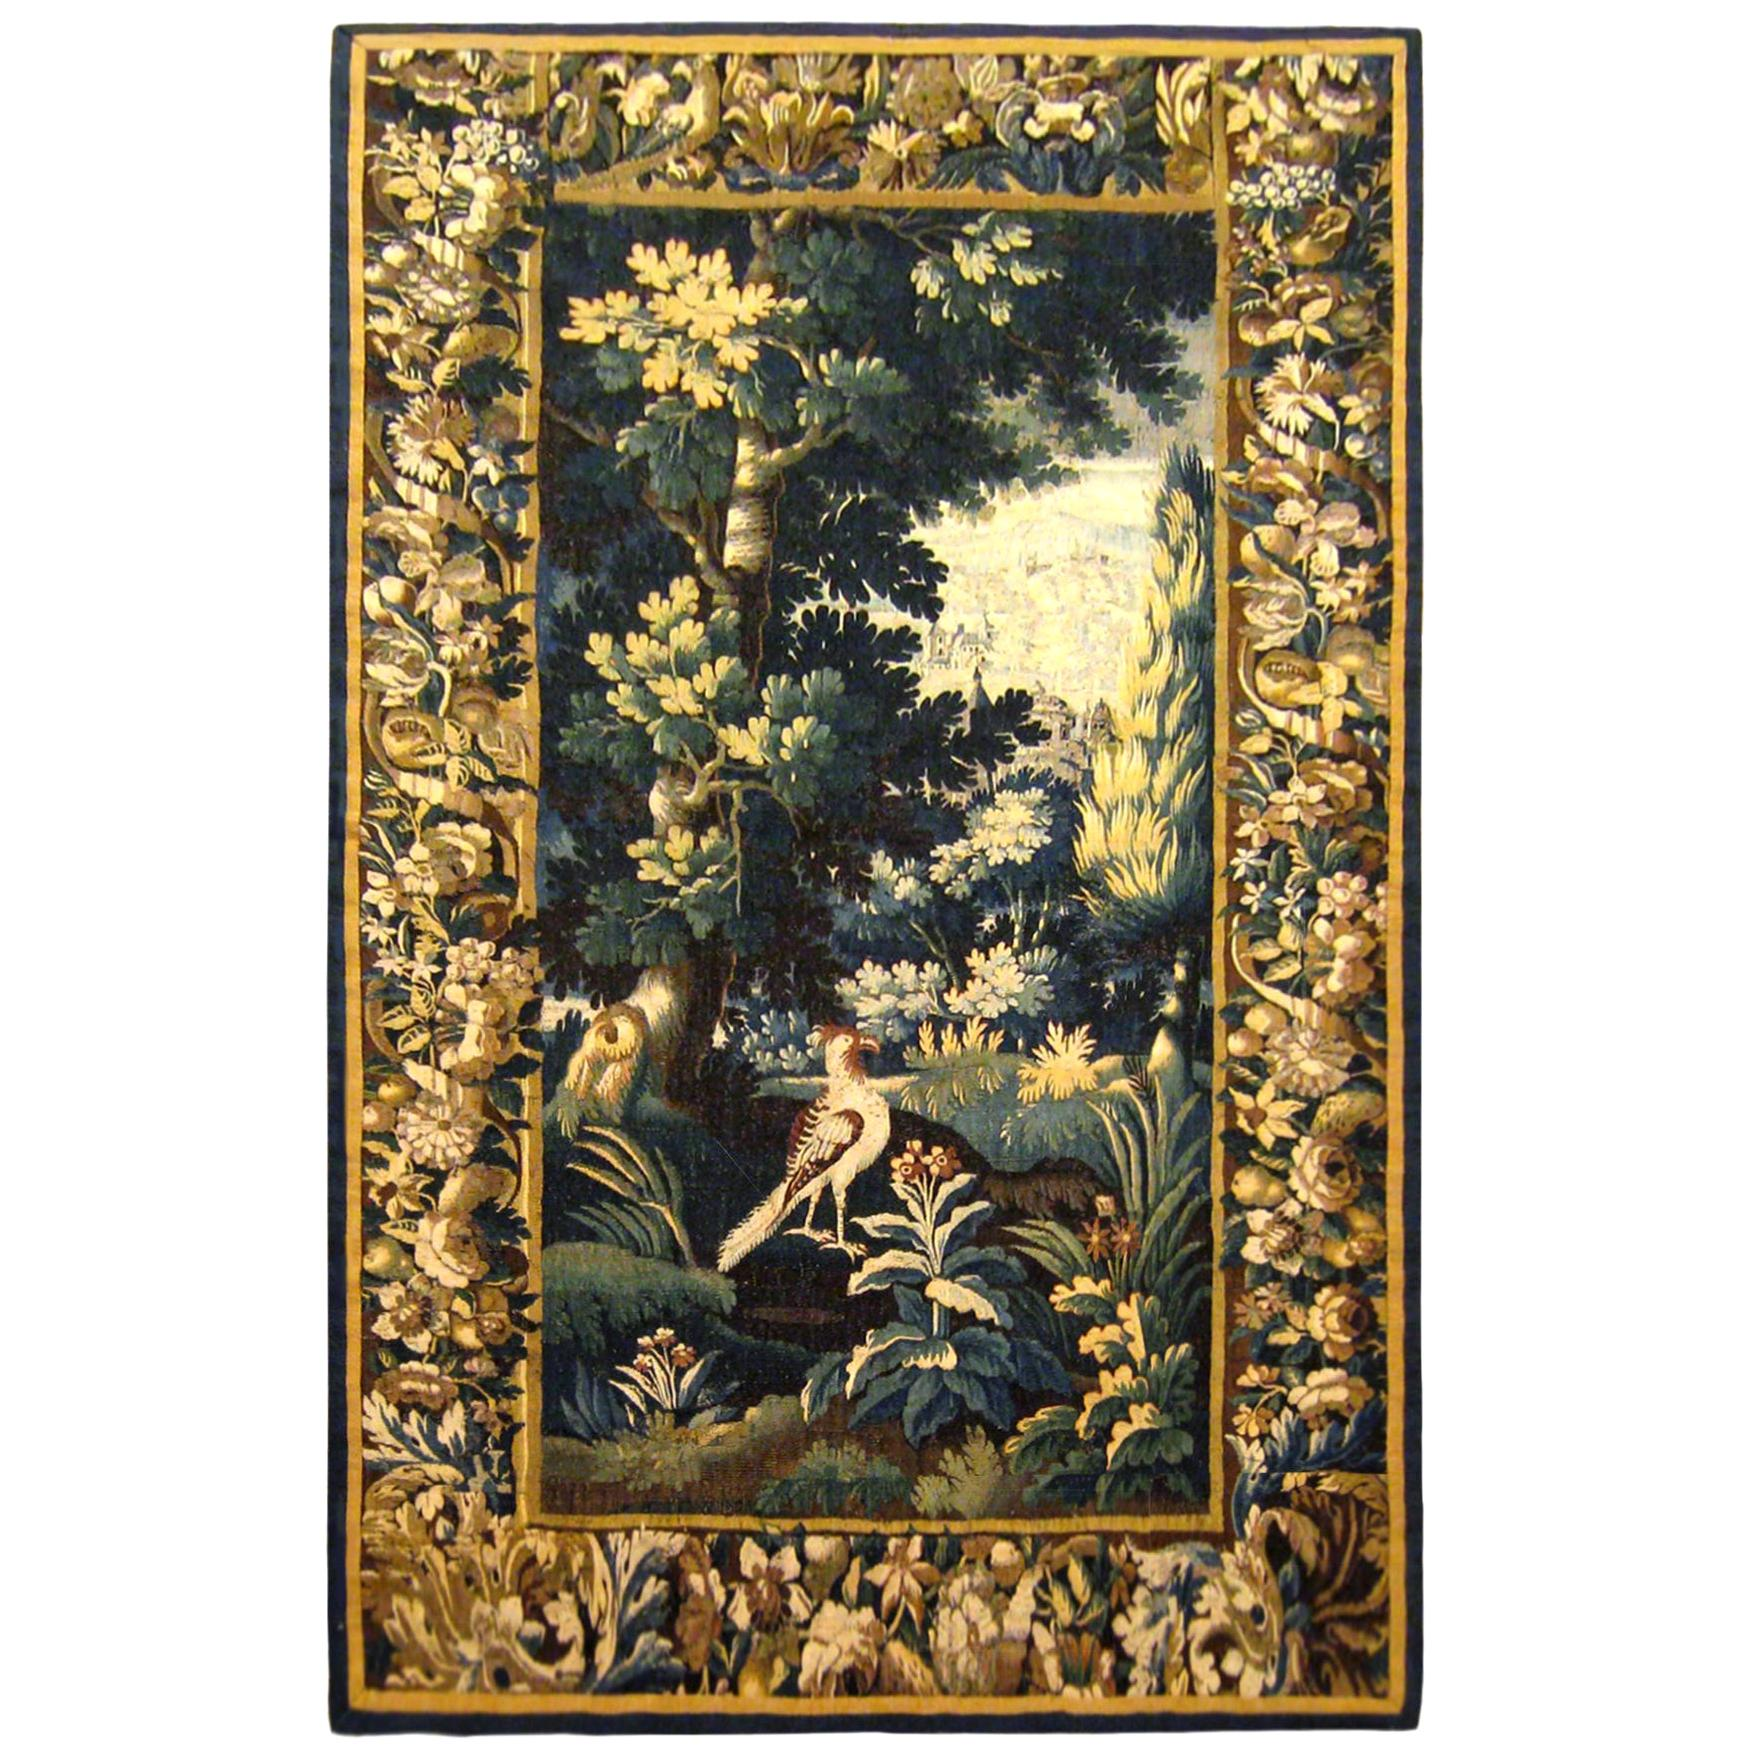 Antique 18th Century Flemish Verdure Tapestry 'from Ralph Lauren Window Display'